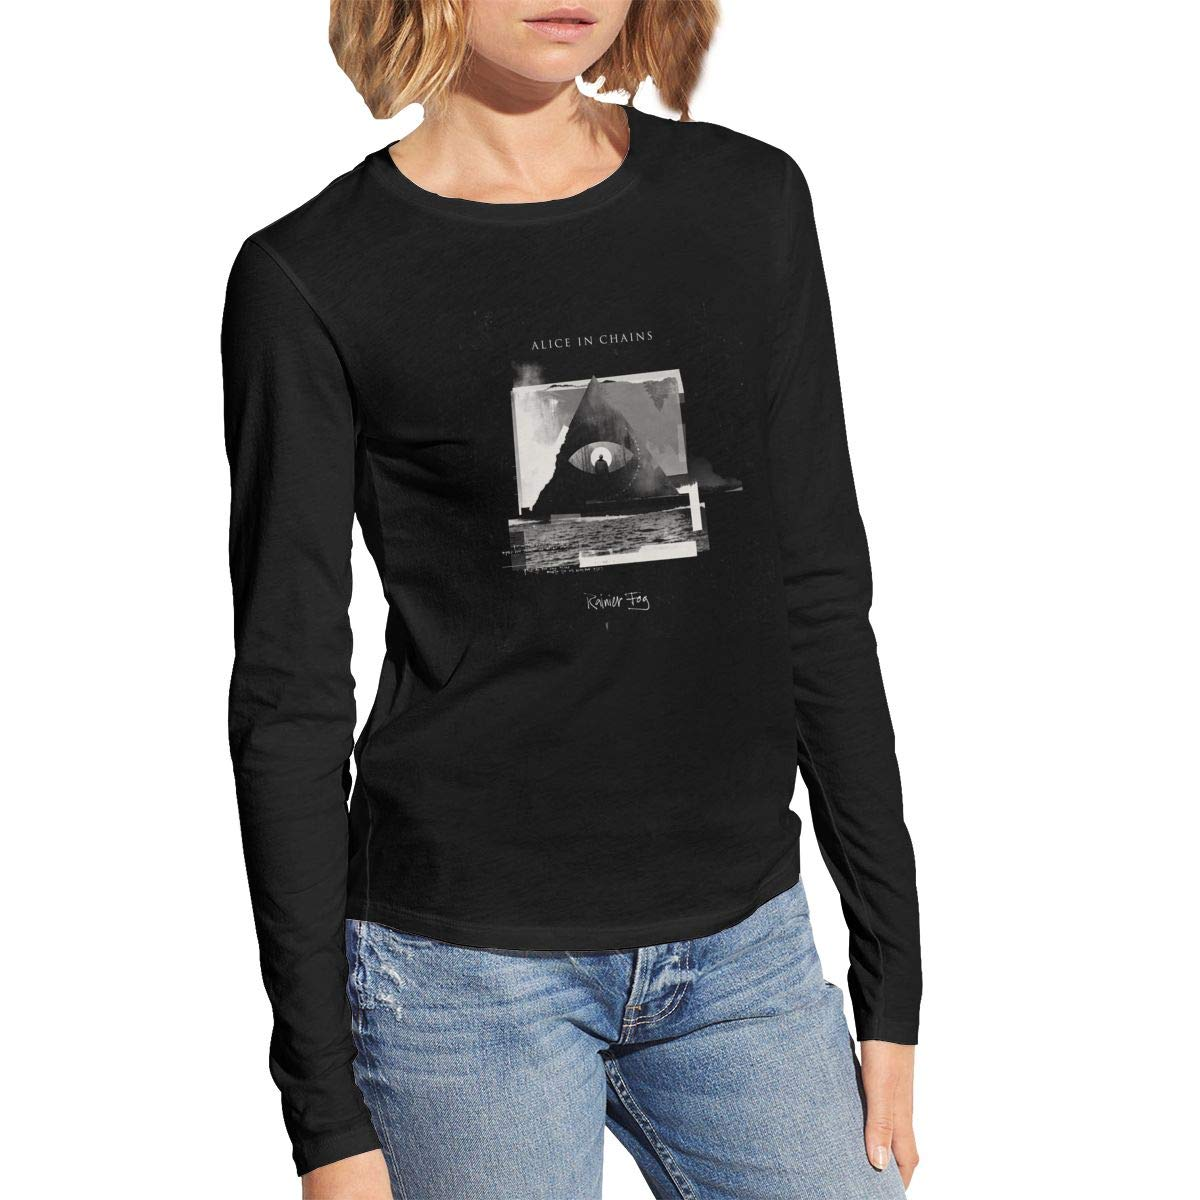 Alice In Chains Rainier Fog Women Comfortable Casual Shirts